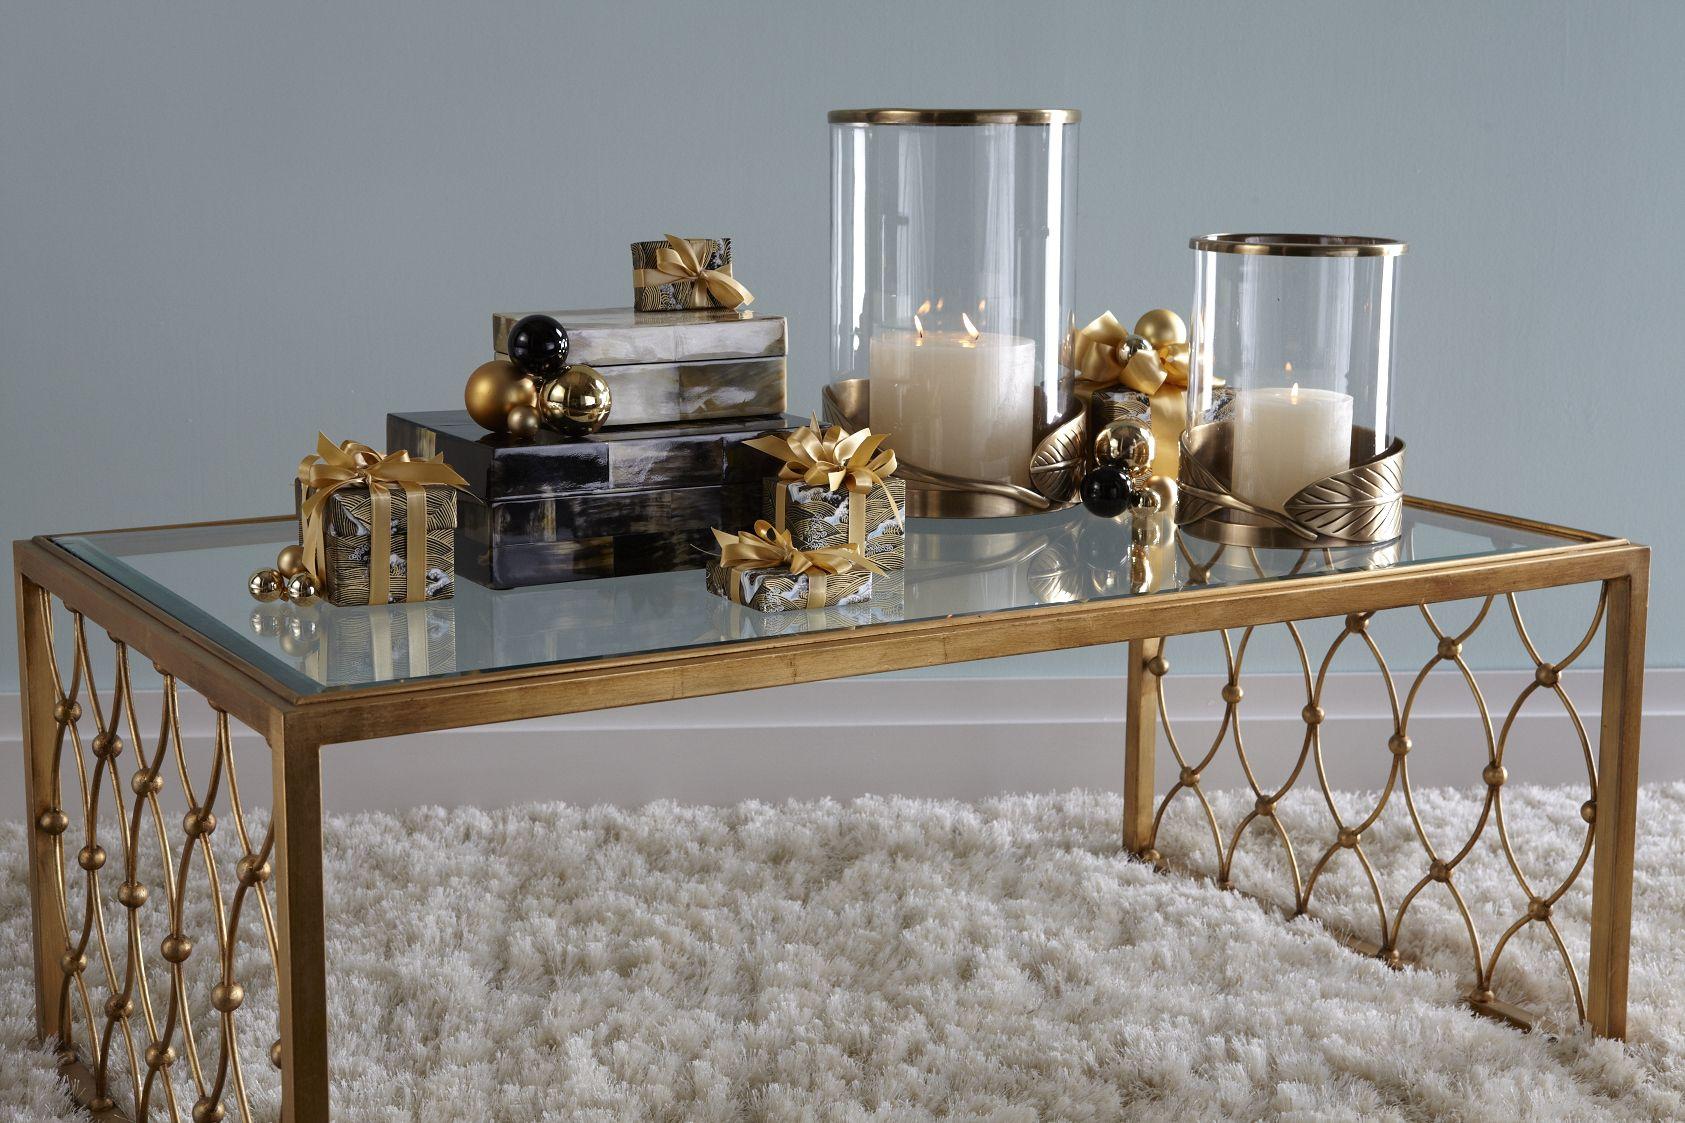 Hawthorne Coffee Table Living Hall Design Coffee Table Gold Coffee Table [ 1123 x 1685 Pixel ]